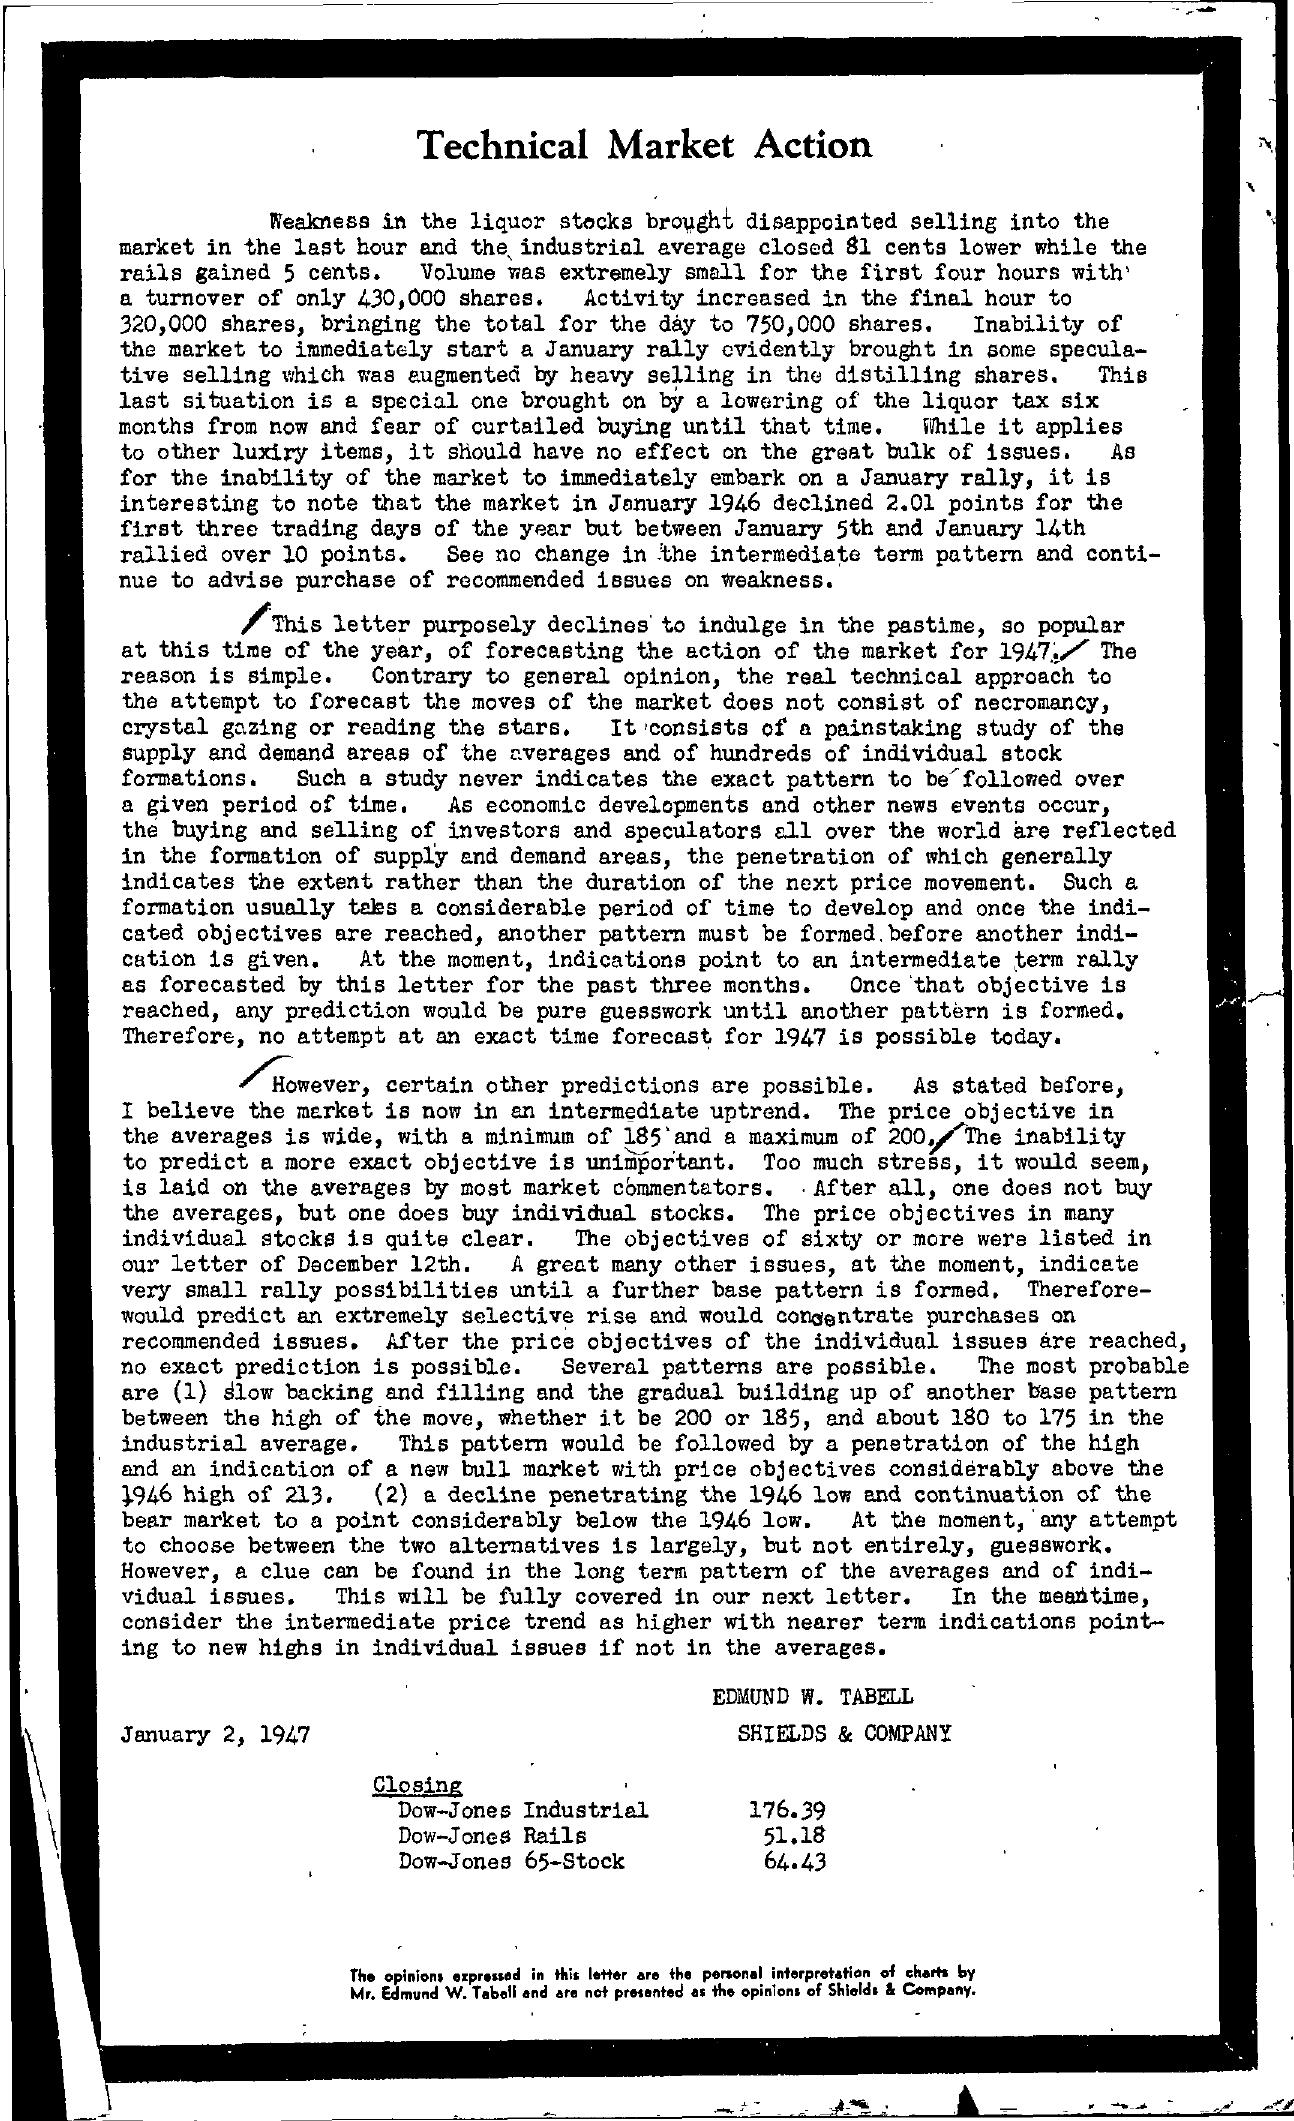 Tabell's Market Letter - January 02, 1947